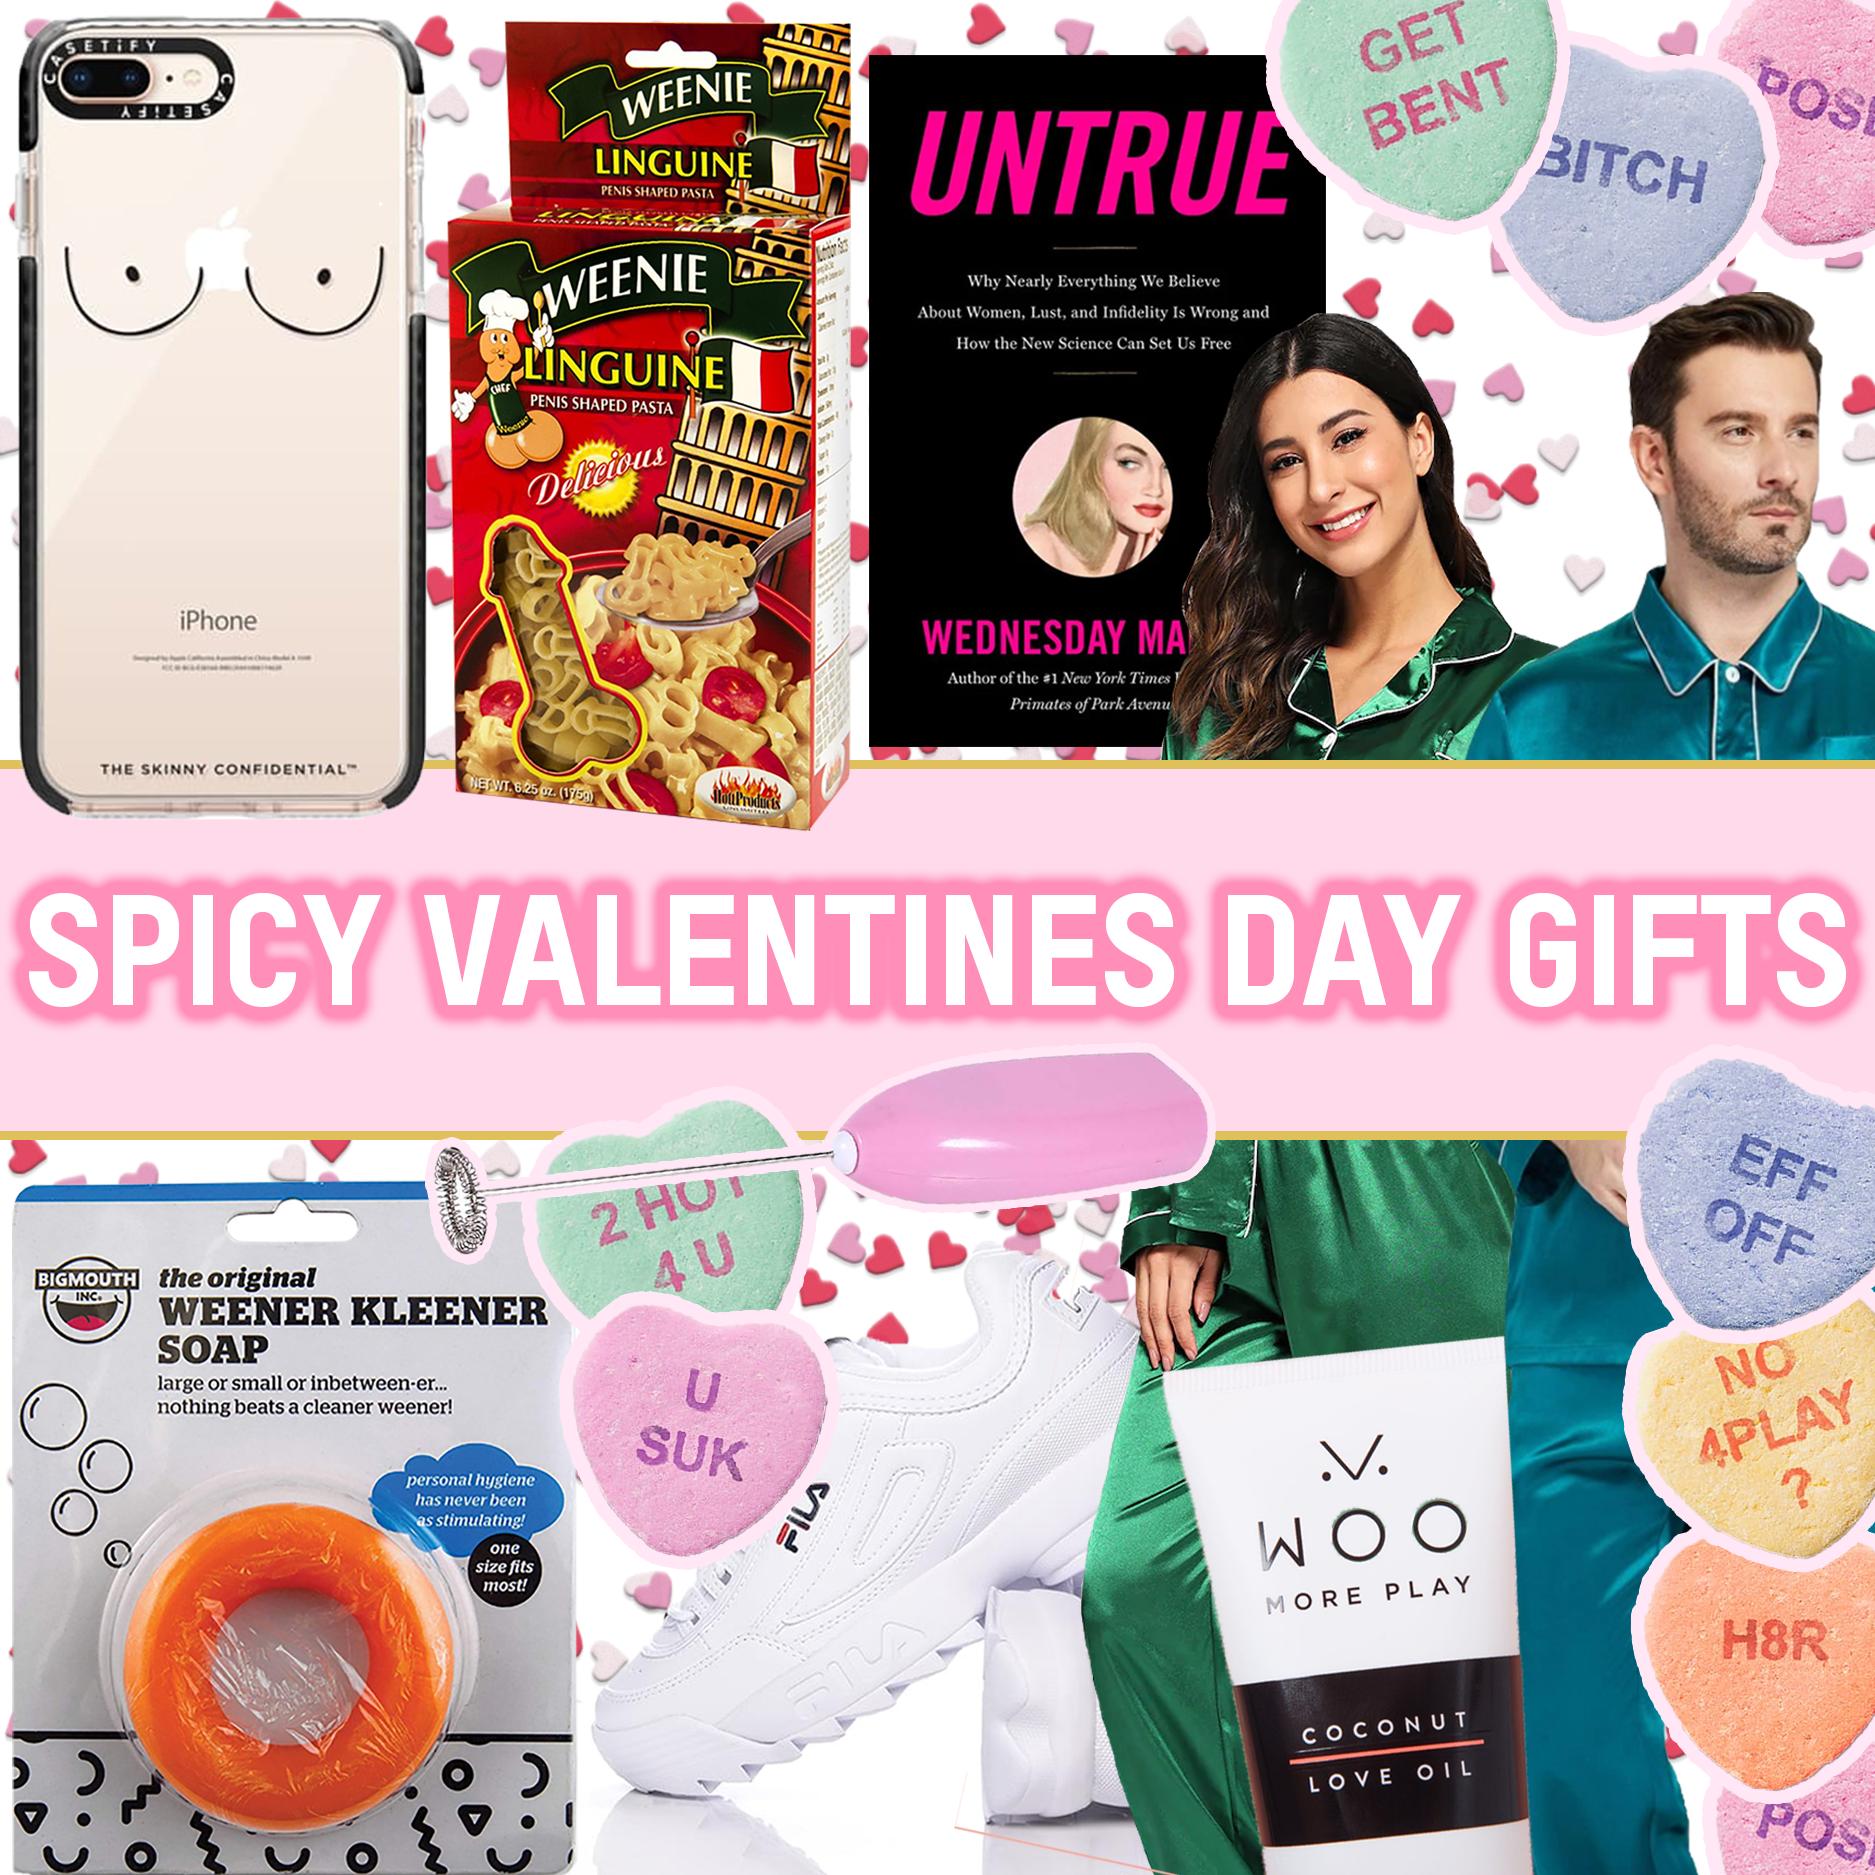 valentines day woo coconut lube boobs pajamas sexuality books untrue